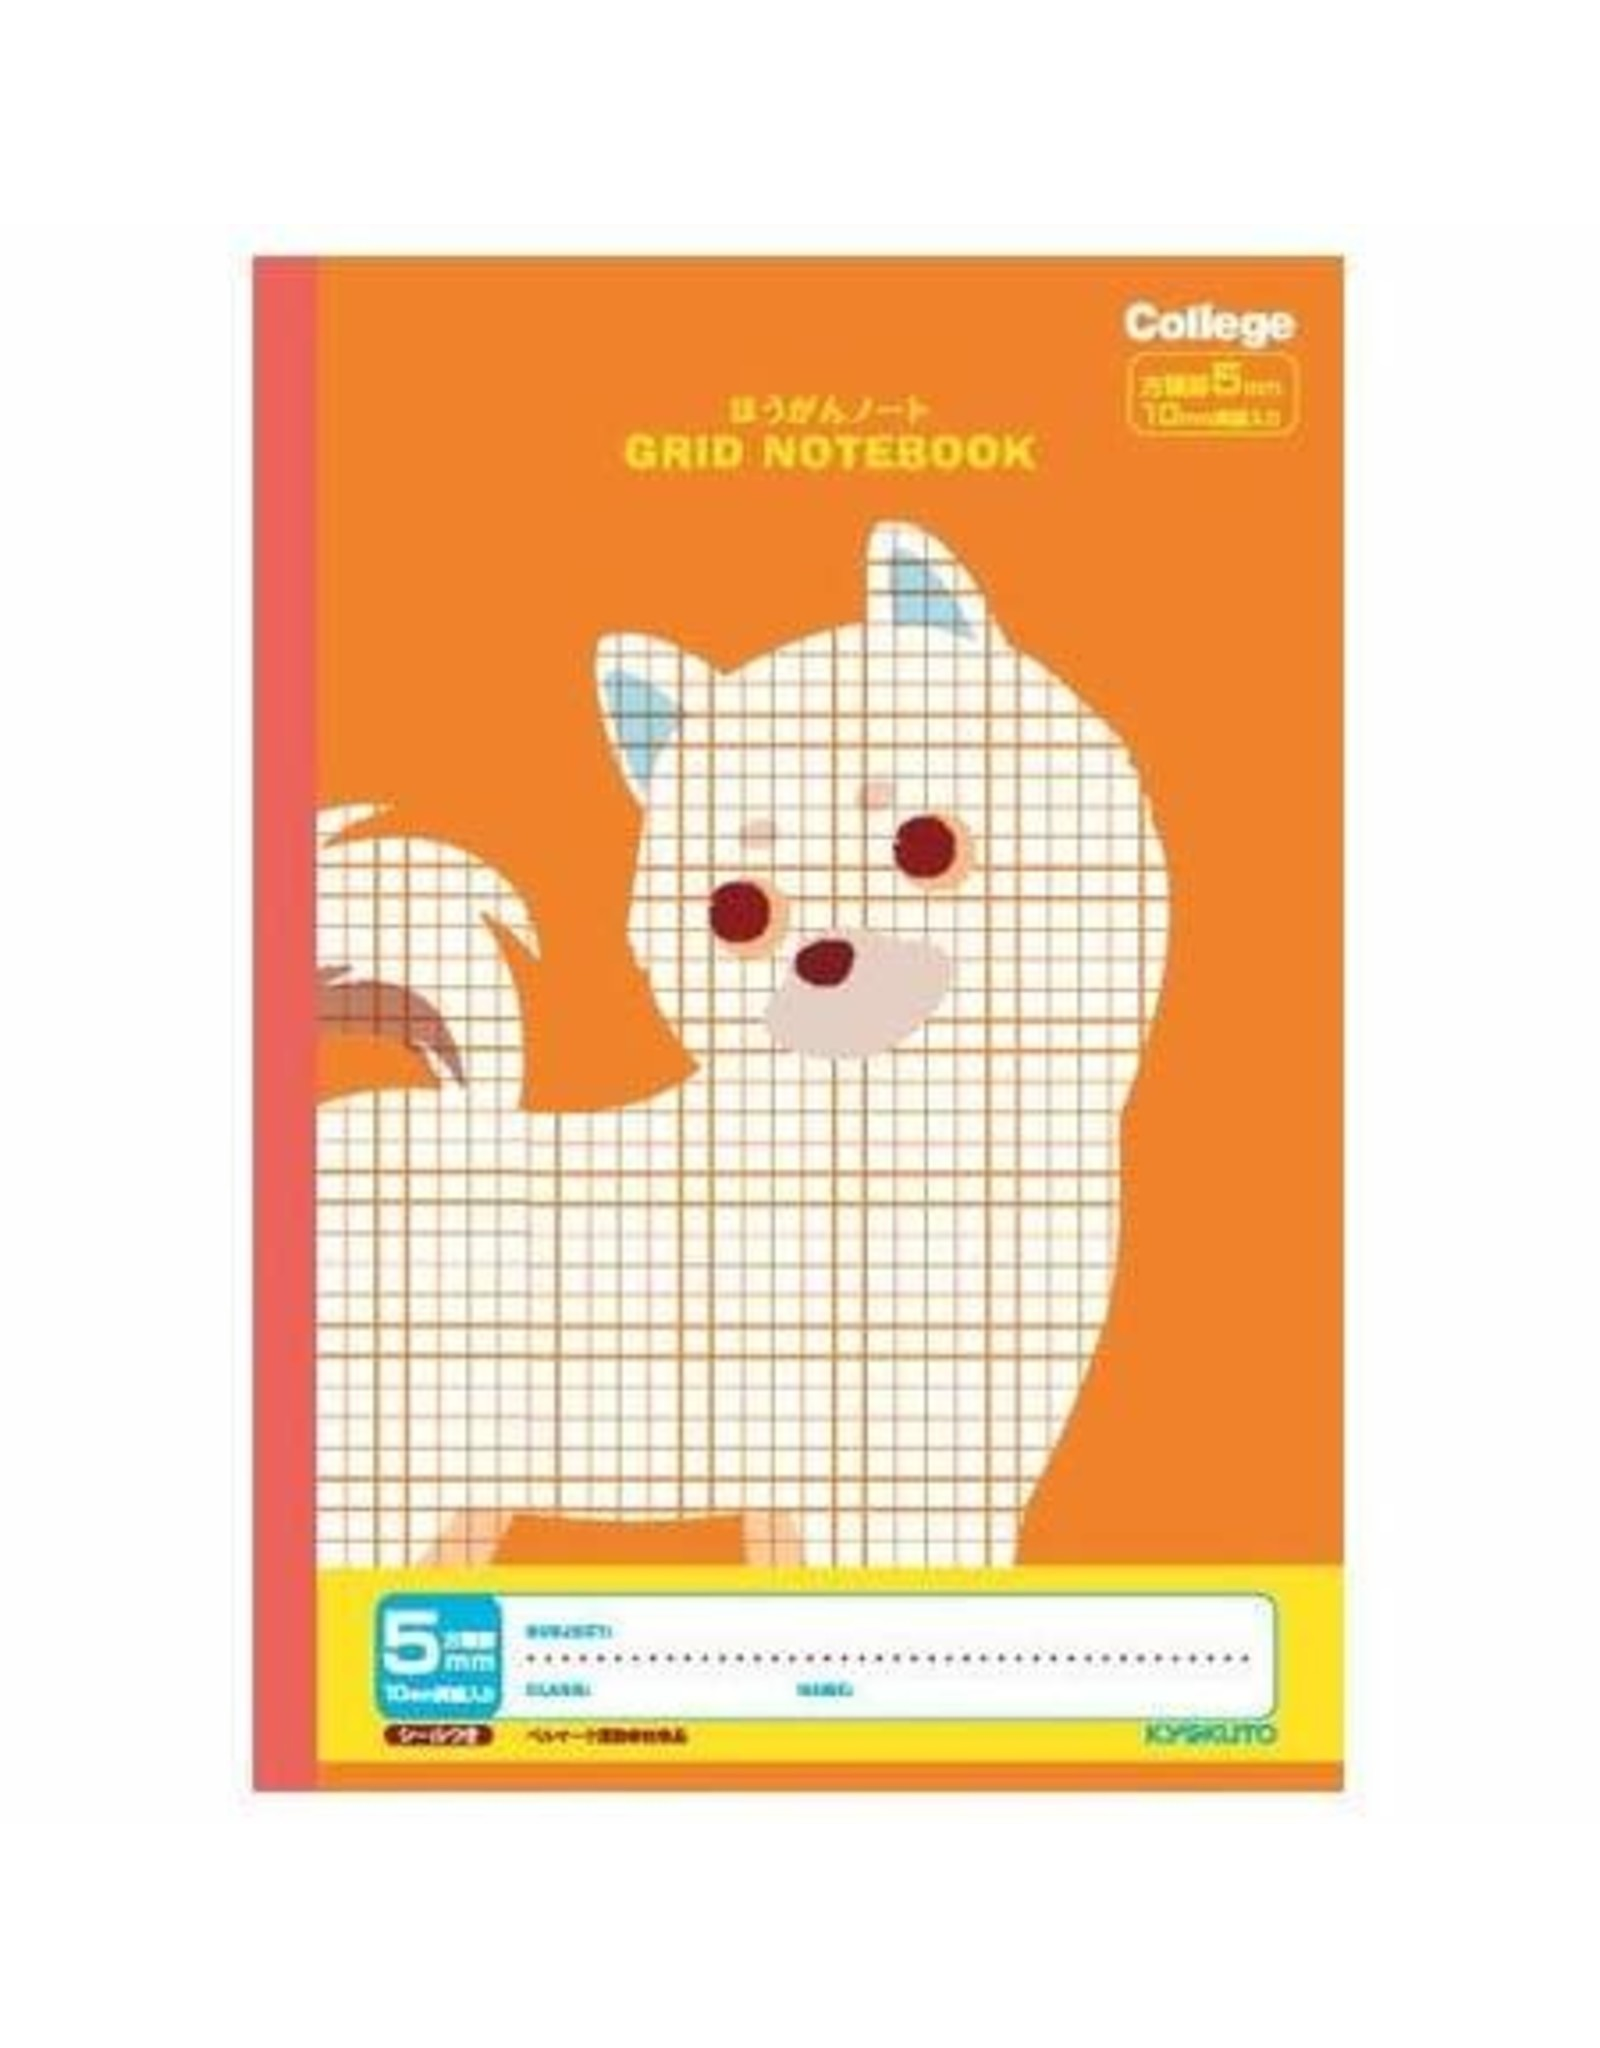 Kyokuto Associates co., ltd. COLLEGE ANIMAL  NOTEBOOK GRID B5 ORANGE DOG